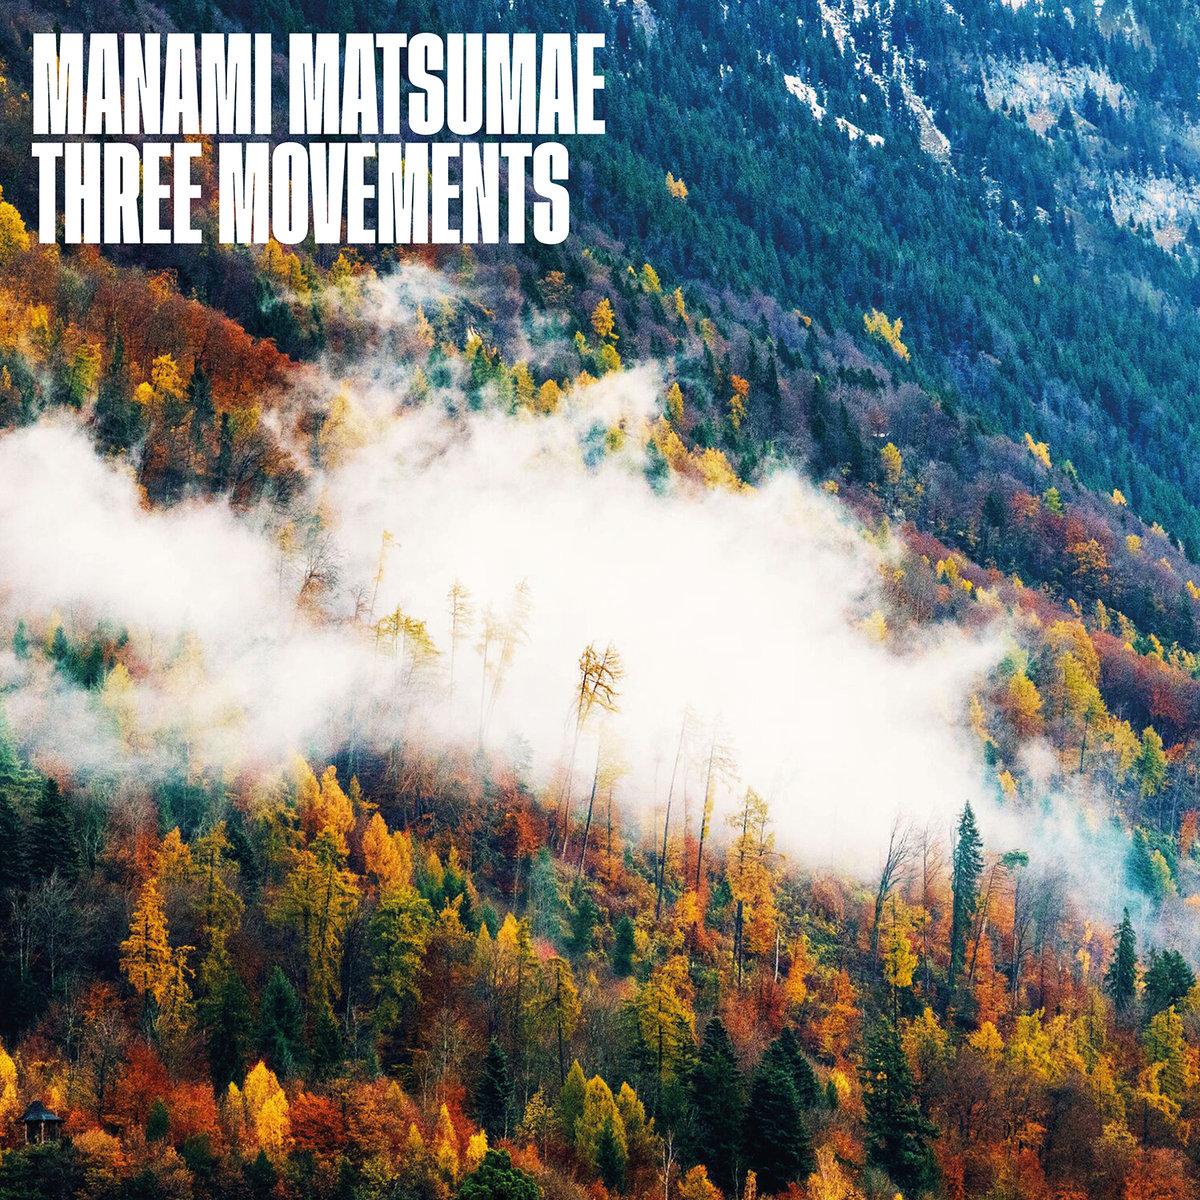 Three Movements (松前真奈美) CD: ¥2,160 / LP: ¥3,780